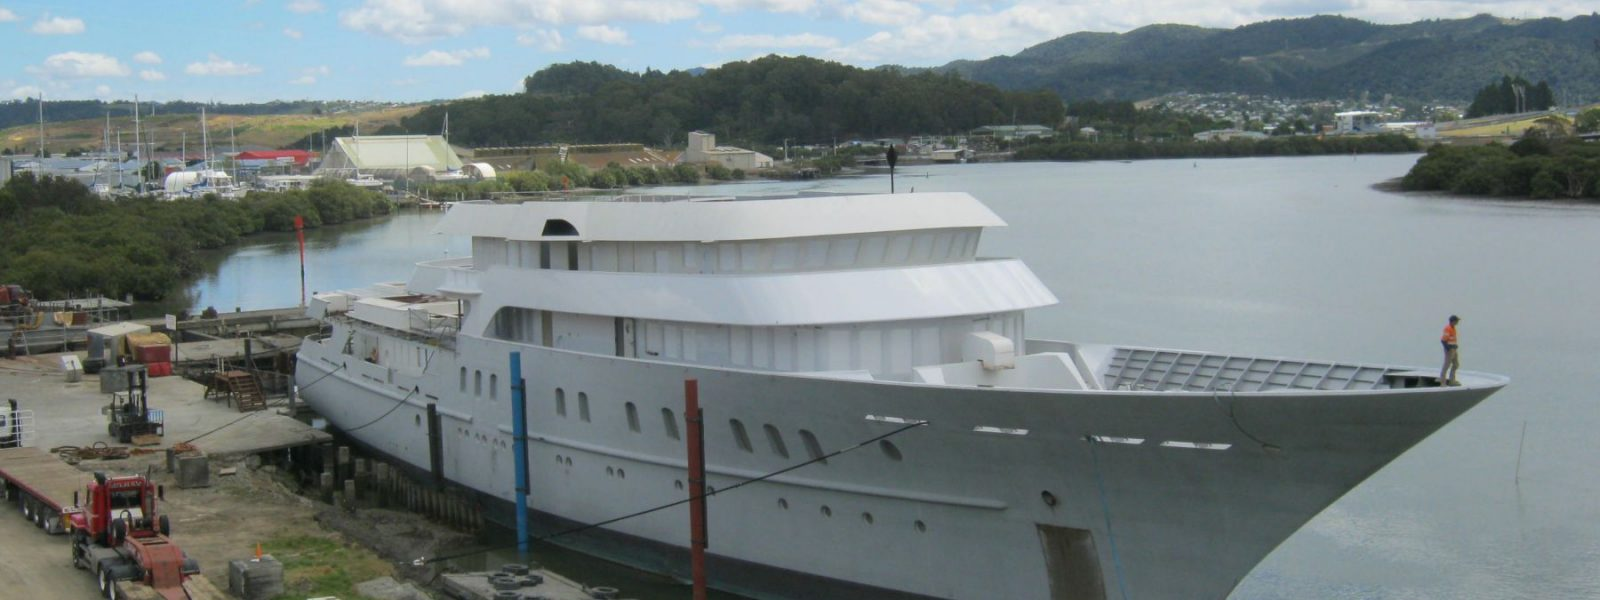 U77 Super-yacht Refit